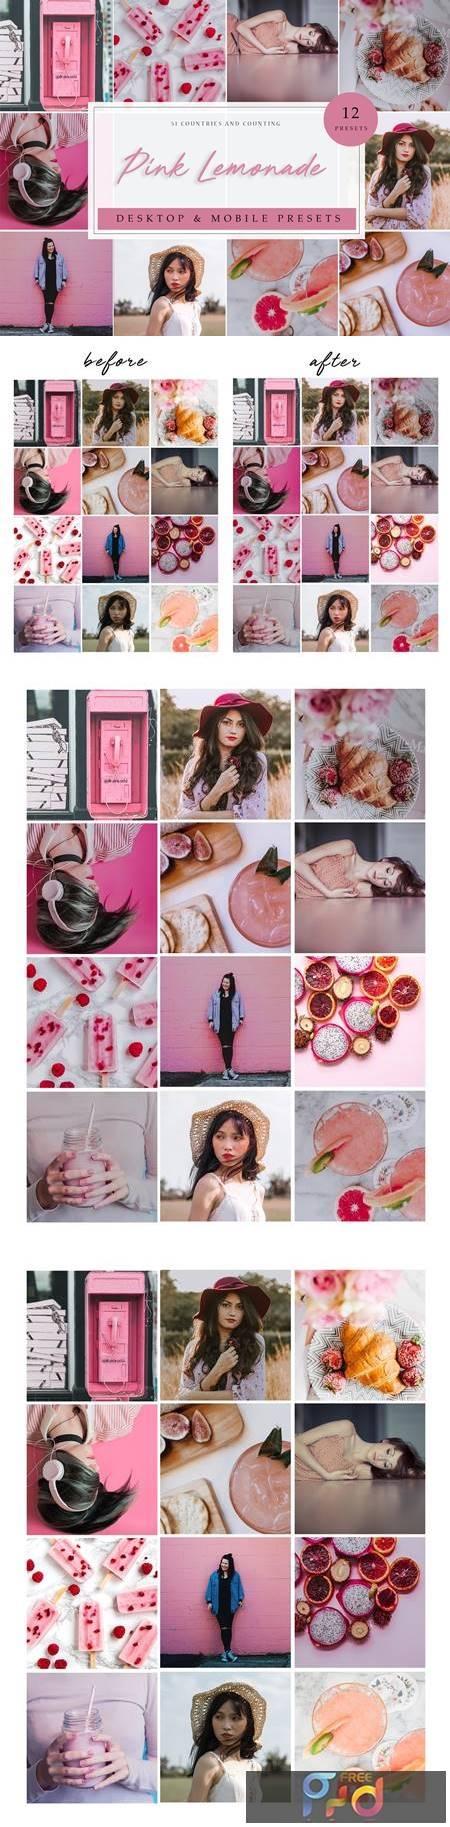 LR Presets - Pink Lemonade 3952516 1